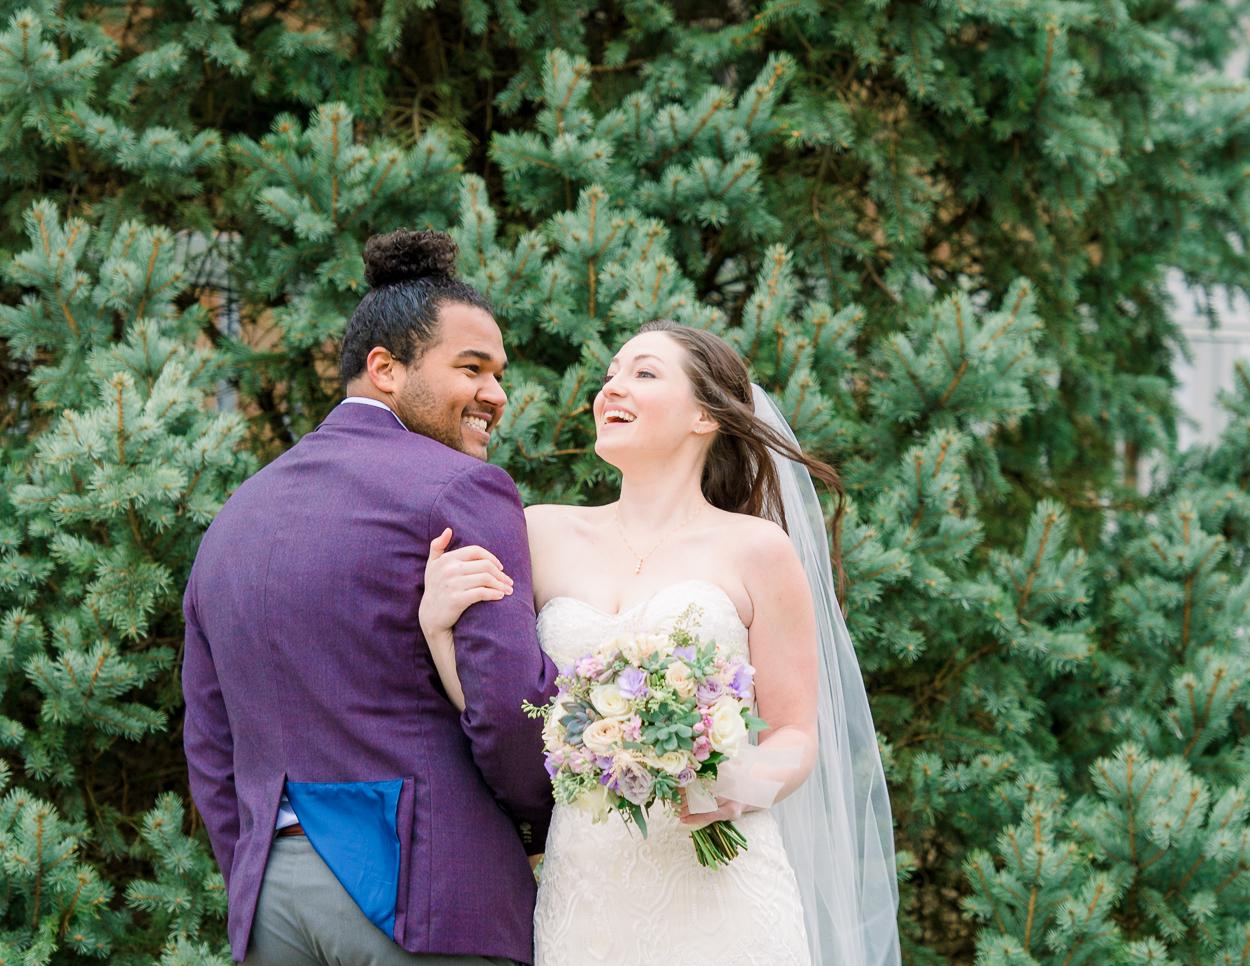 BigCork_vineyard wedding_virginiaweddingphotographer_youseephotography_SarahJames (61).JPG